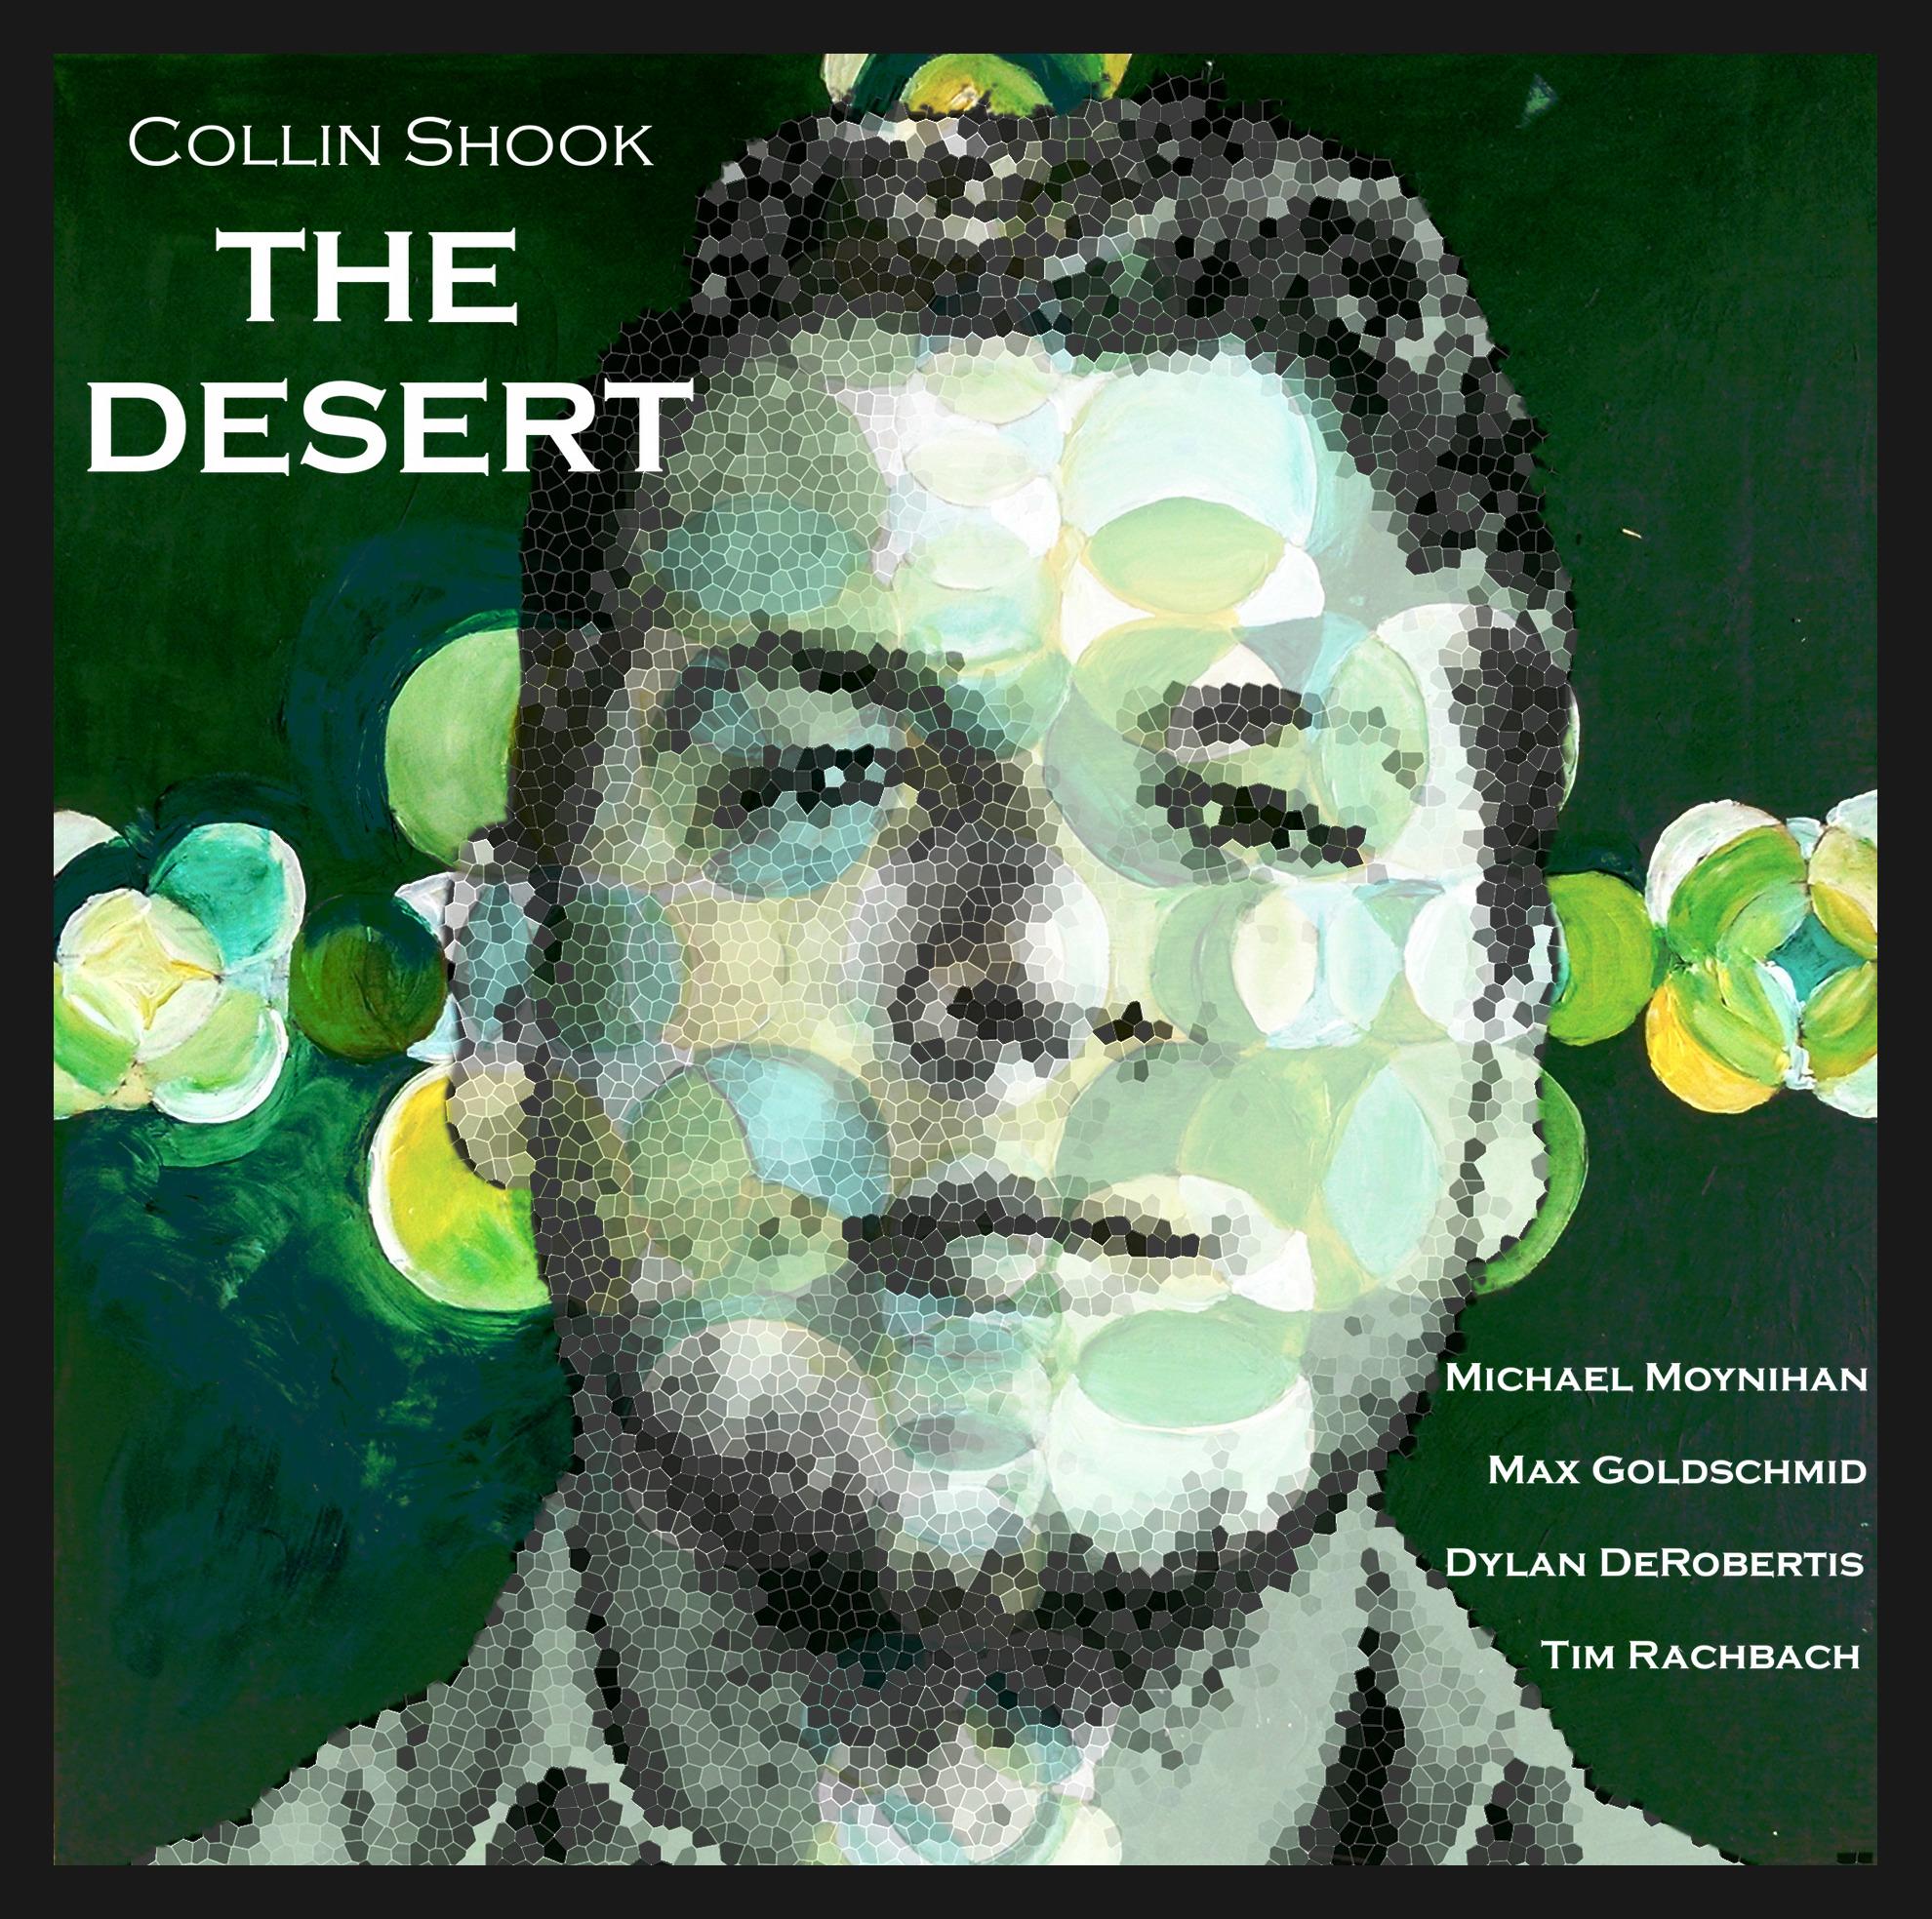 The Desert Album Cover